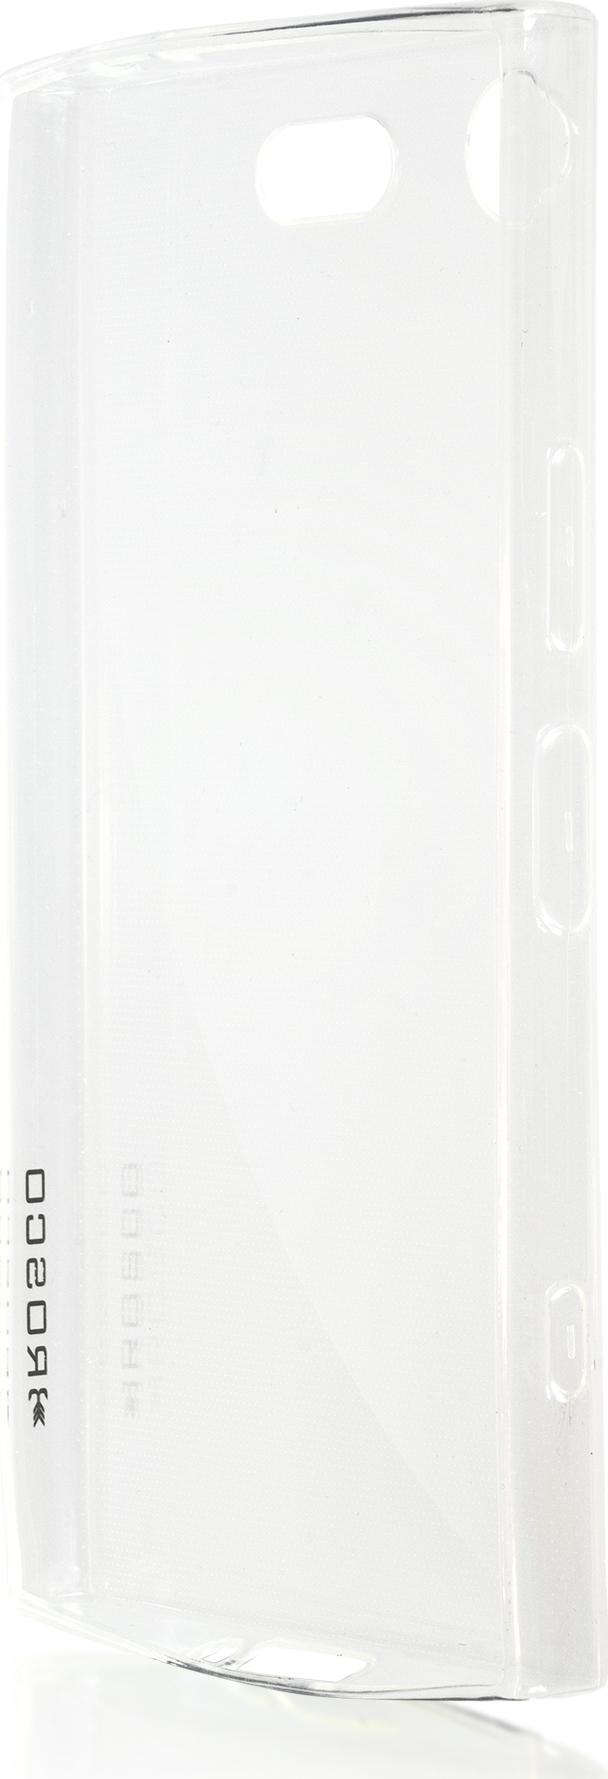 Чехол Brosco TPU для Sony Xperia XZ1 Compact, прозрачный